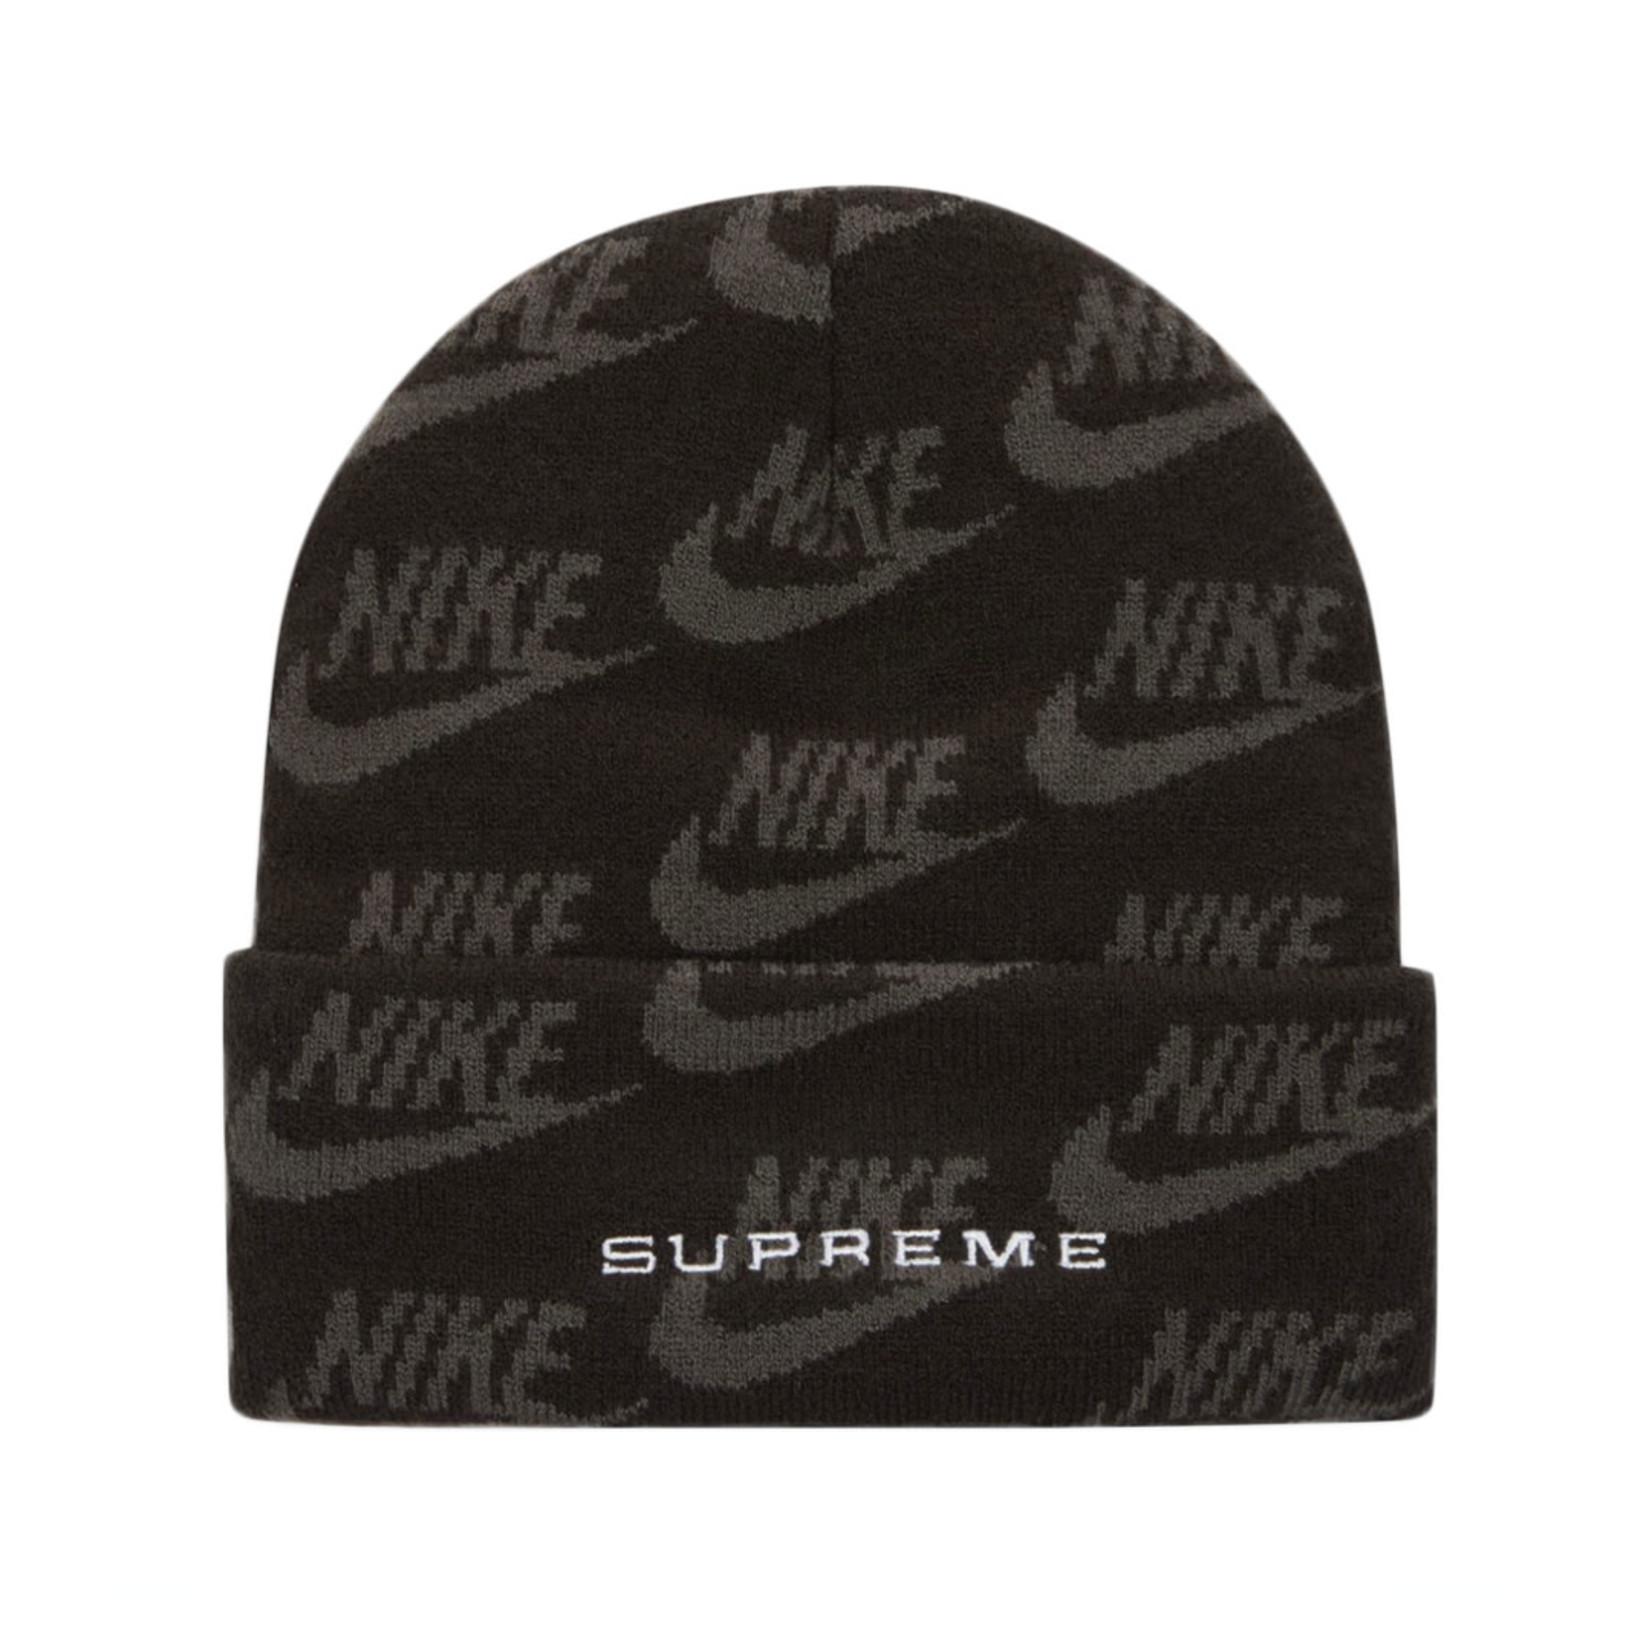 Supreme Supreme Nike Jacquard Logos Beanie (C)